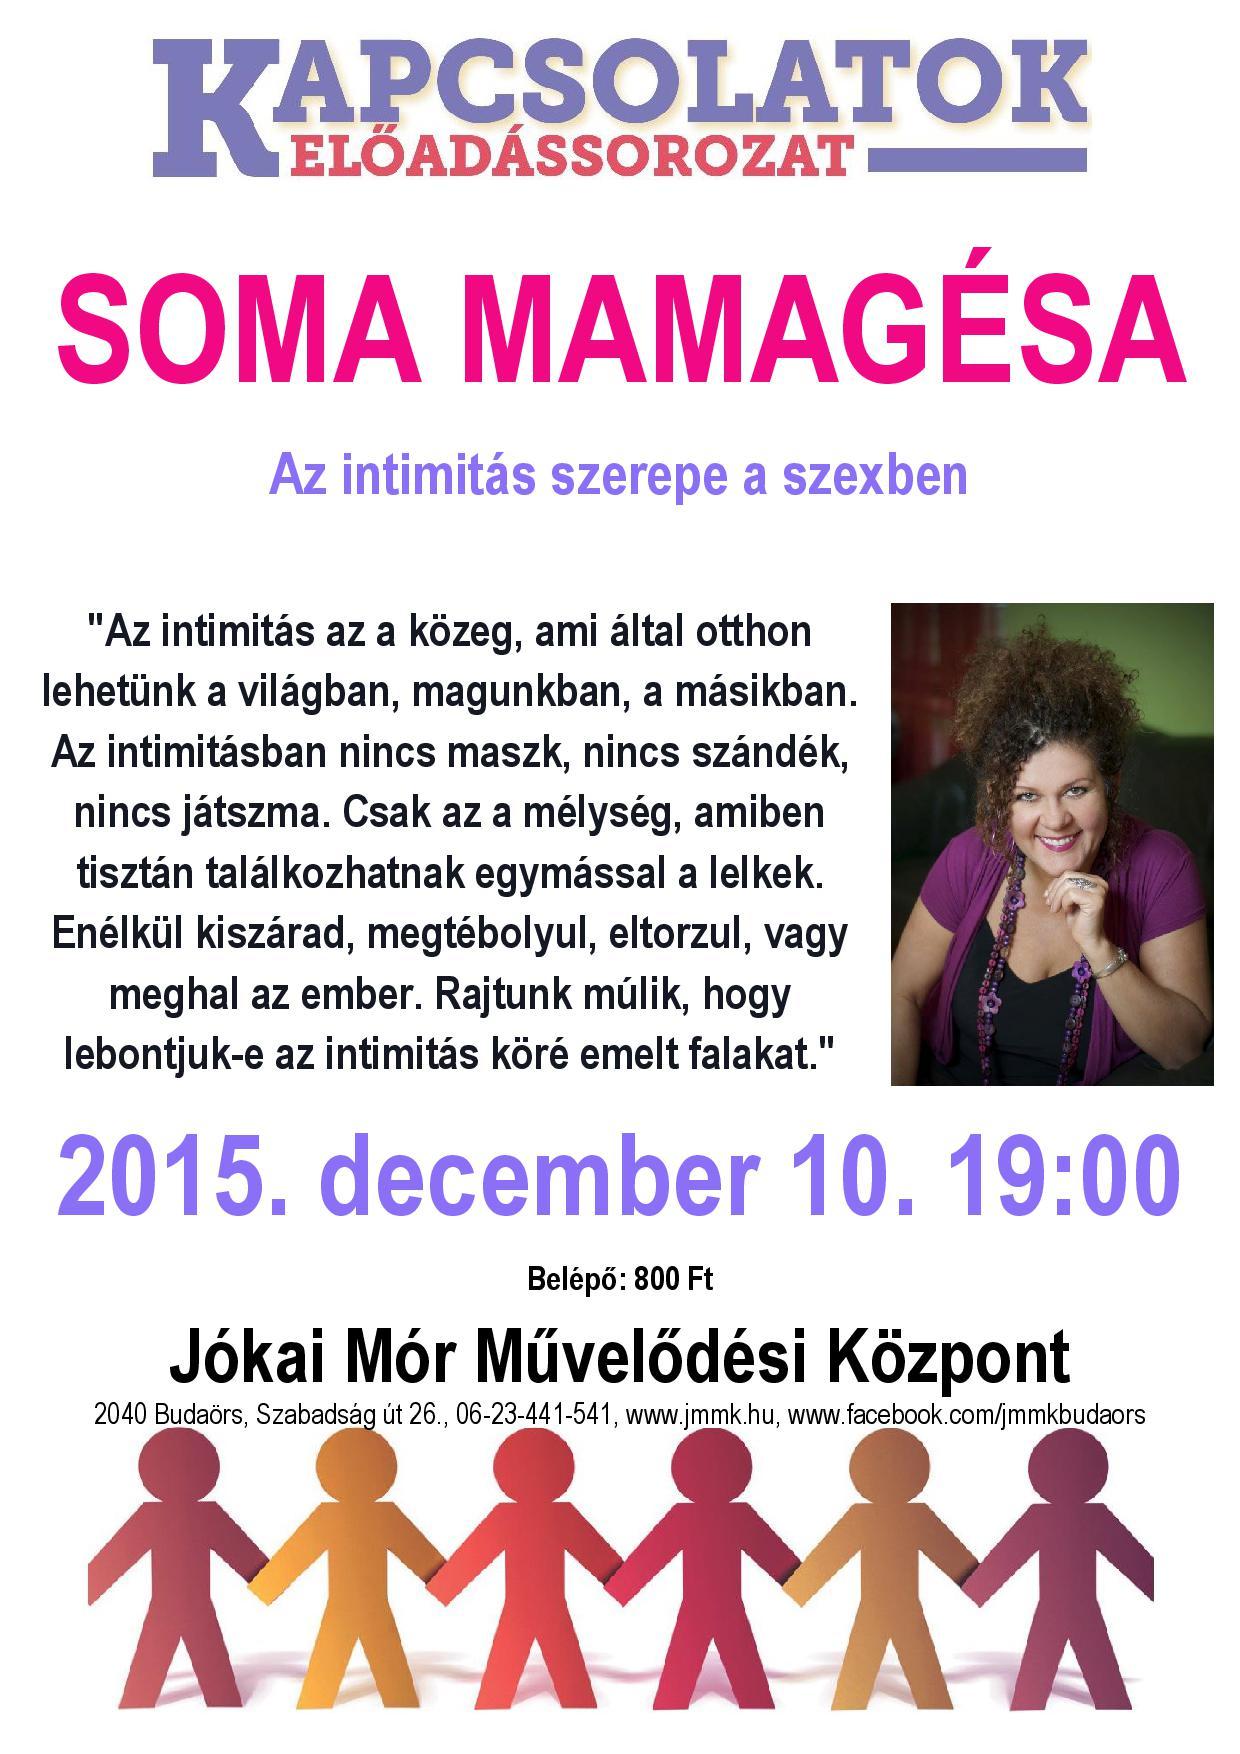 Soma plakát